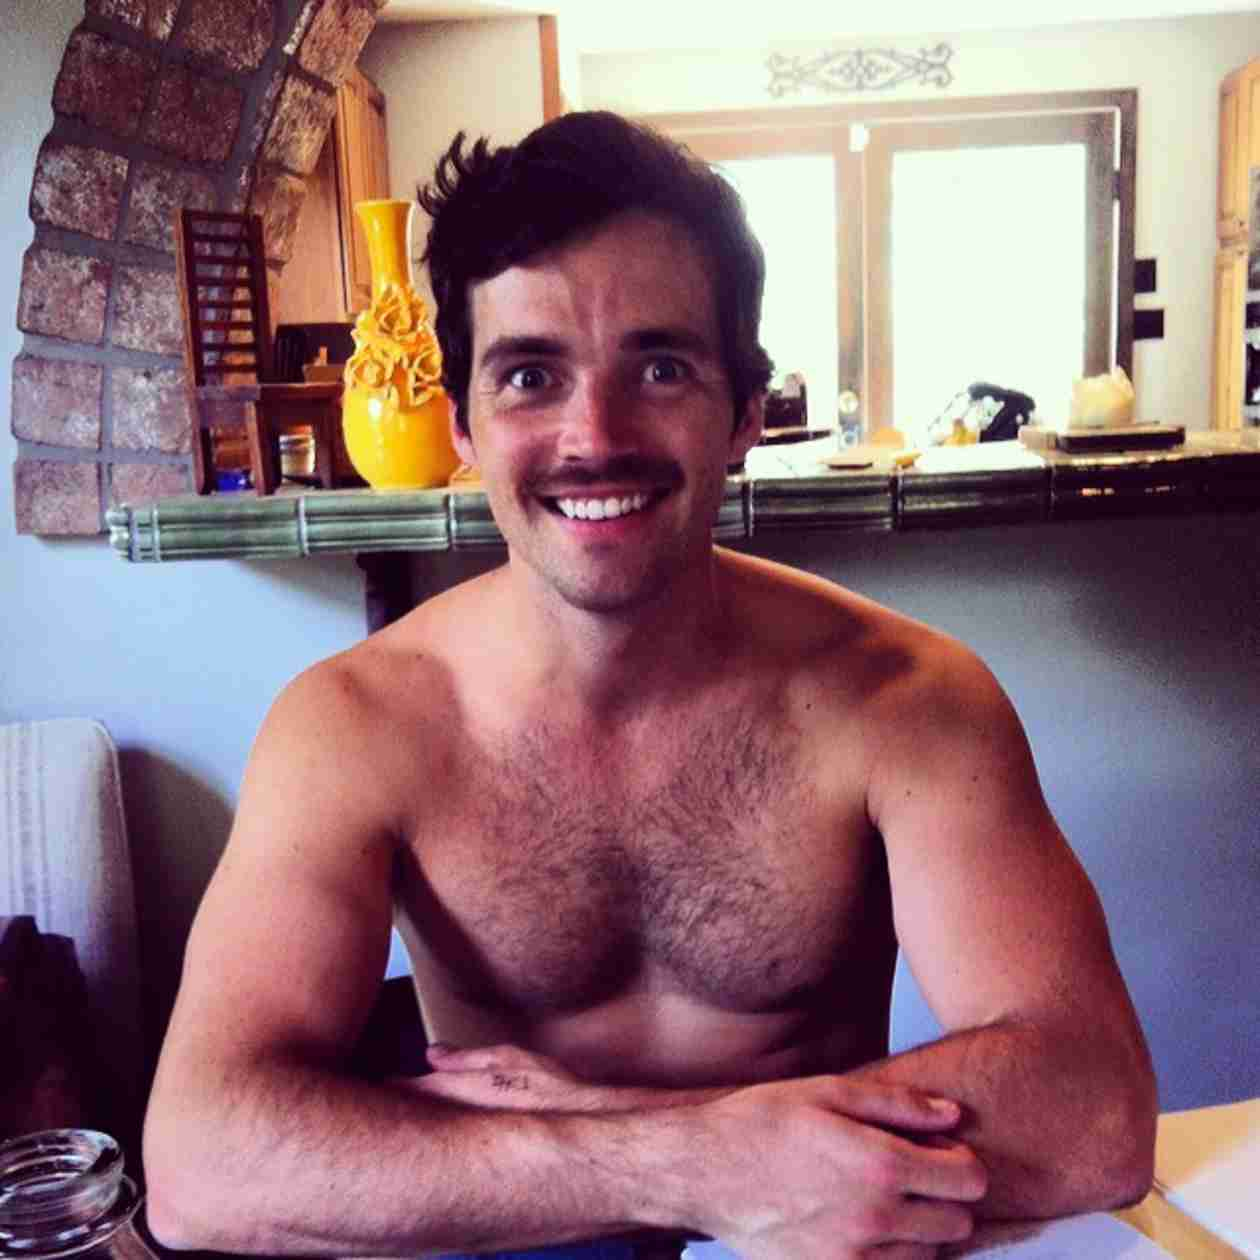 Ian Harding Rocks a Mustache in Epic Shirtless Selfie (PHOTO)